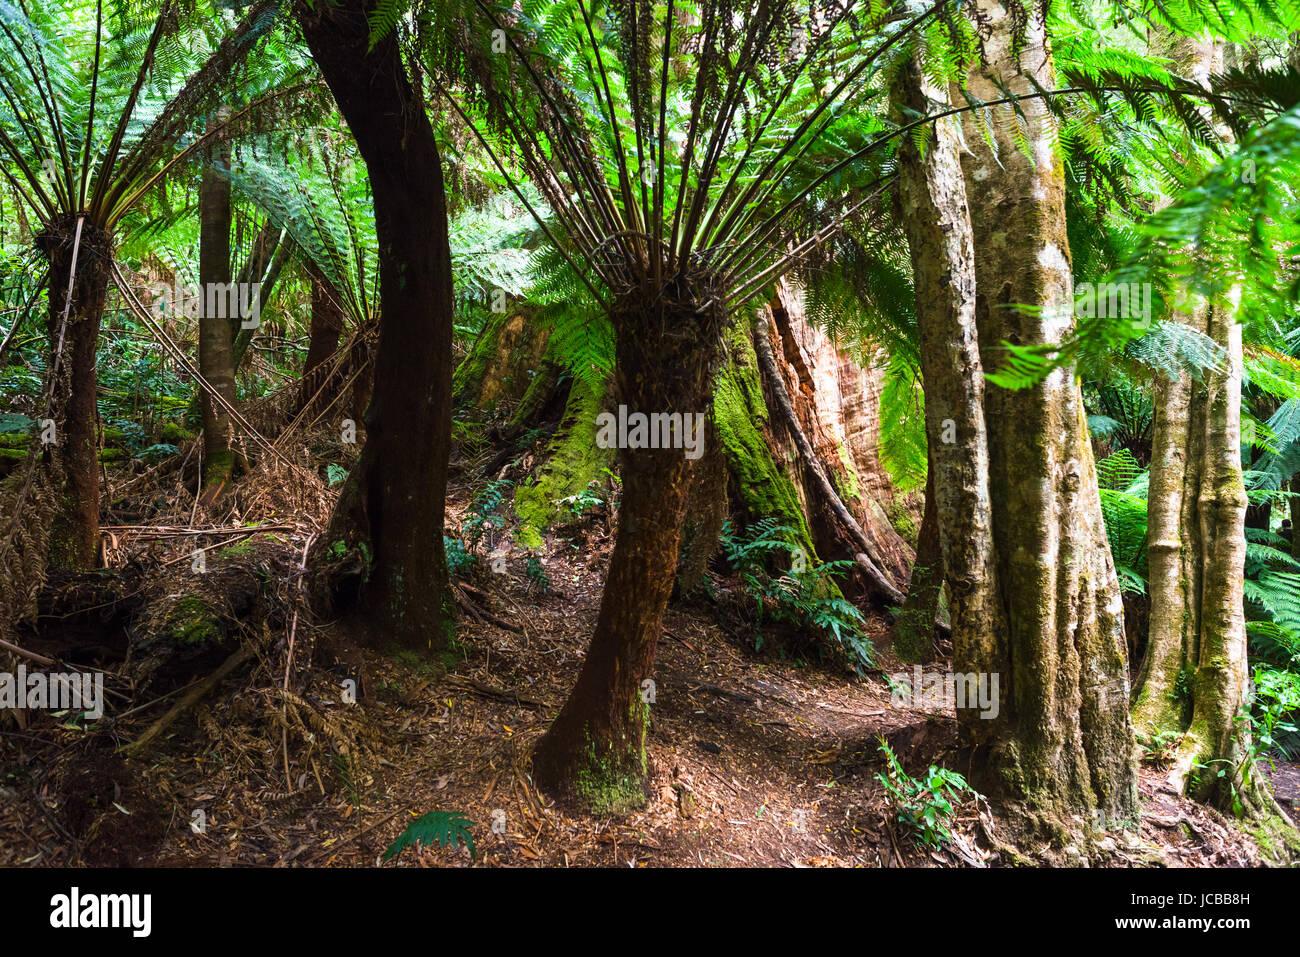 Dicksonia antarctica Rain forest at Melba Gully State Park, Great Otway National Park, Vitoria, Australia. - Stock Image